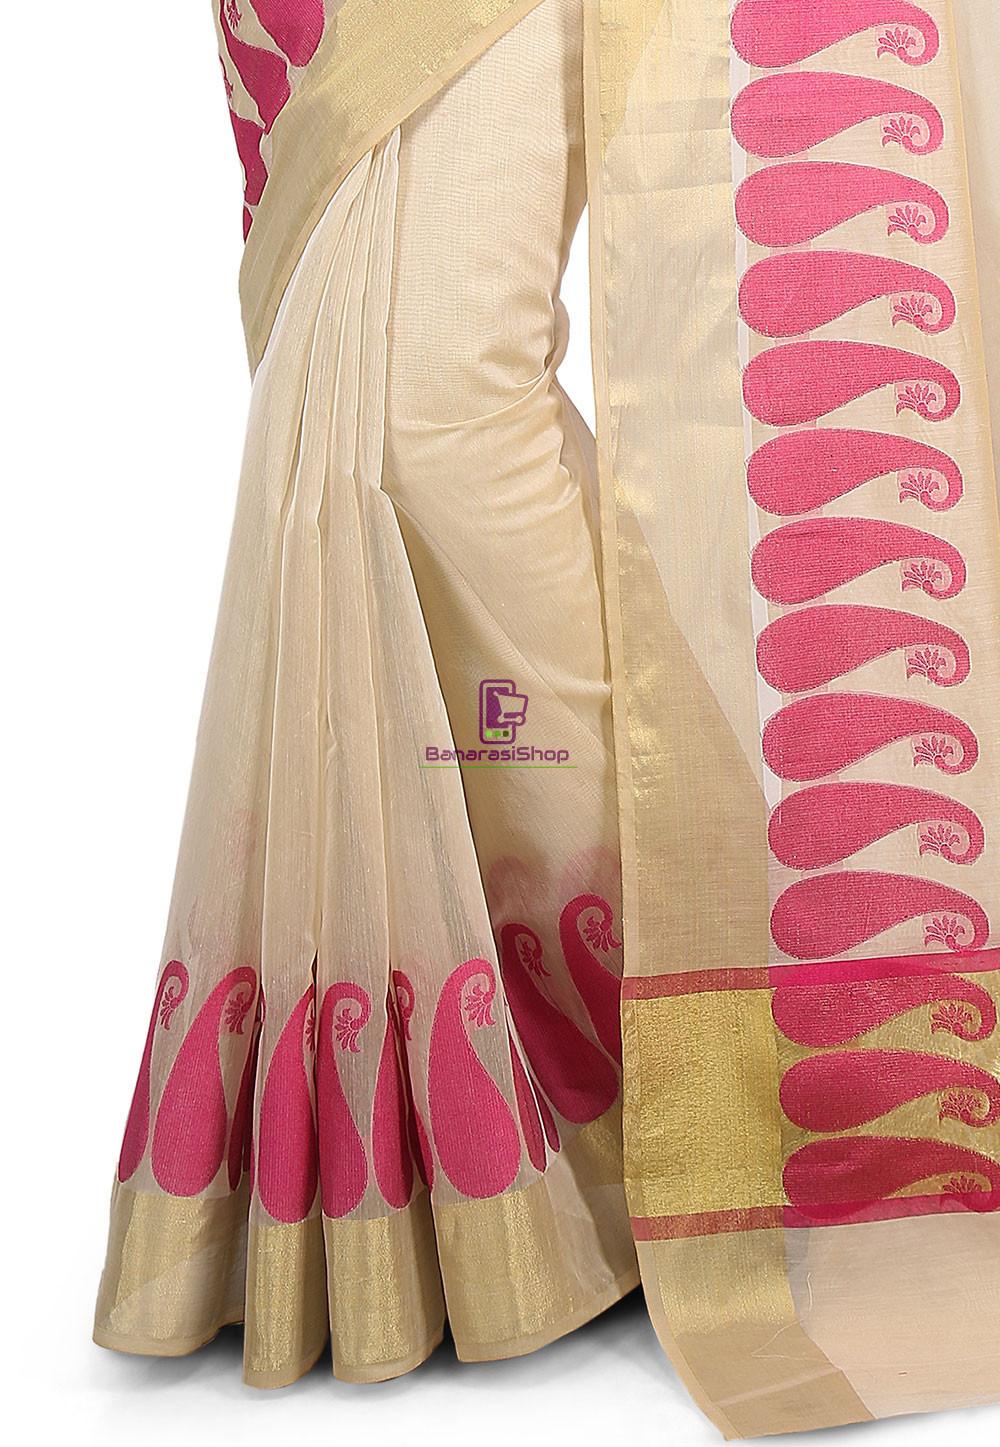 Woven Banarasi Chanderi Cotton Saree in Beige 3